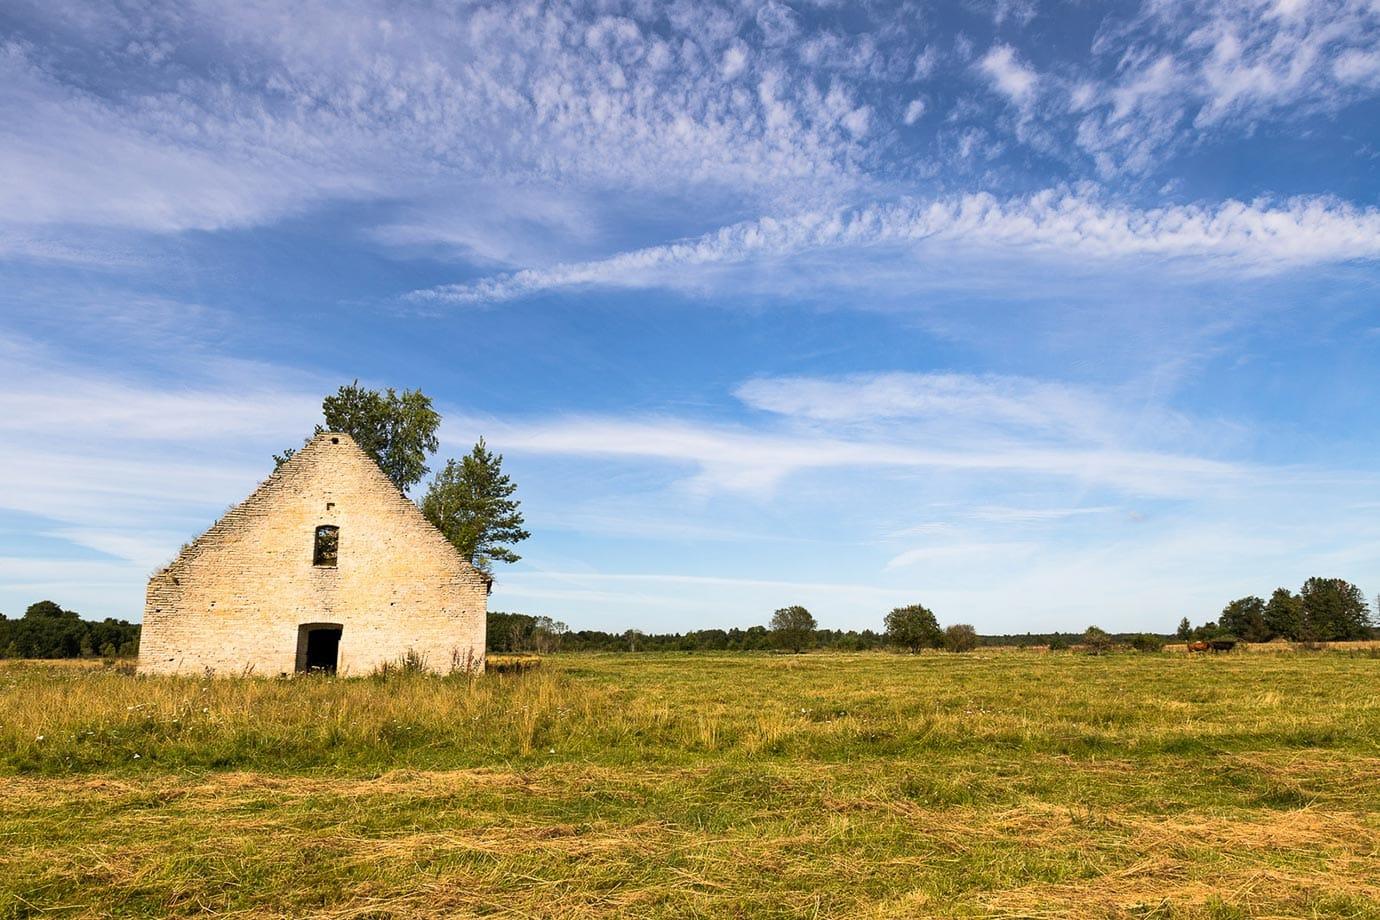 Abandoned farm house in Estonia